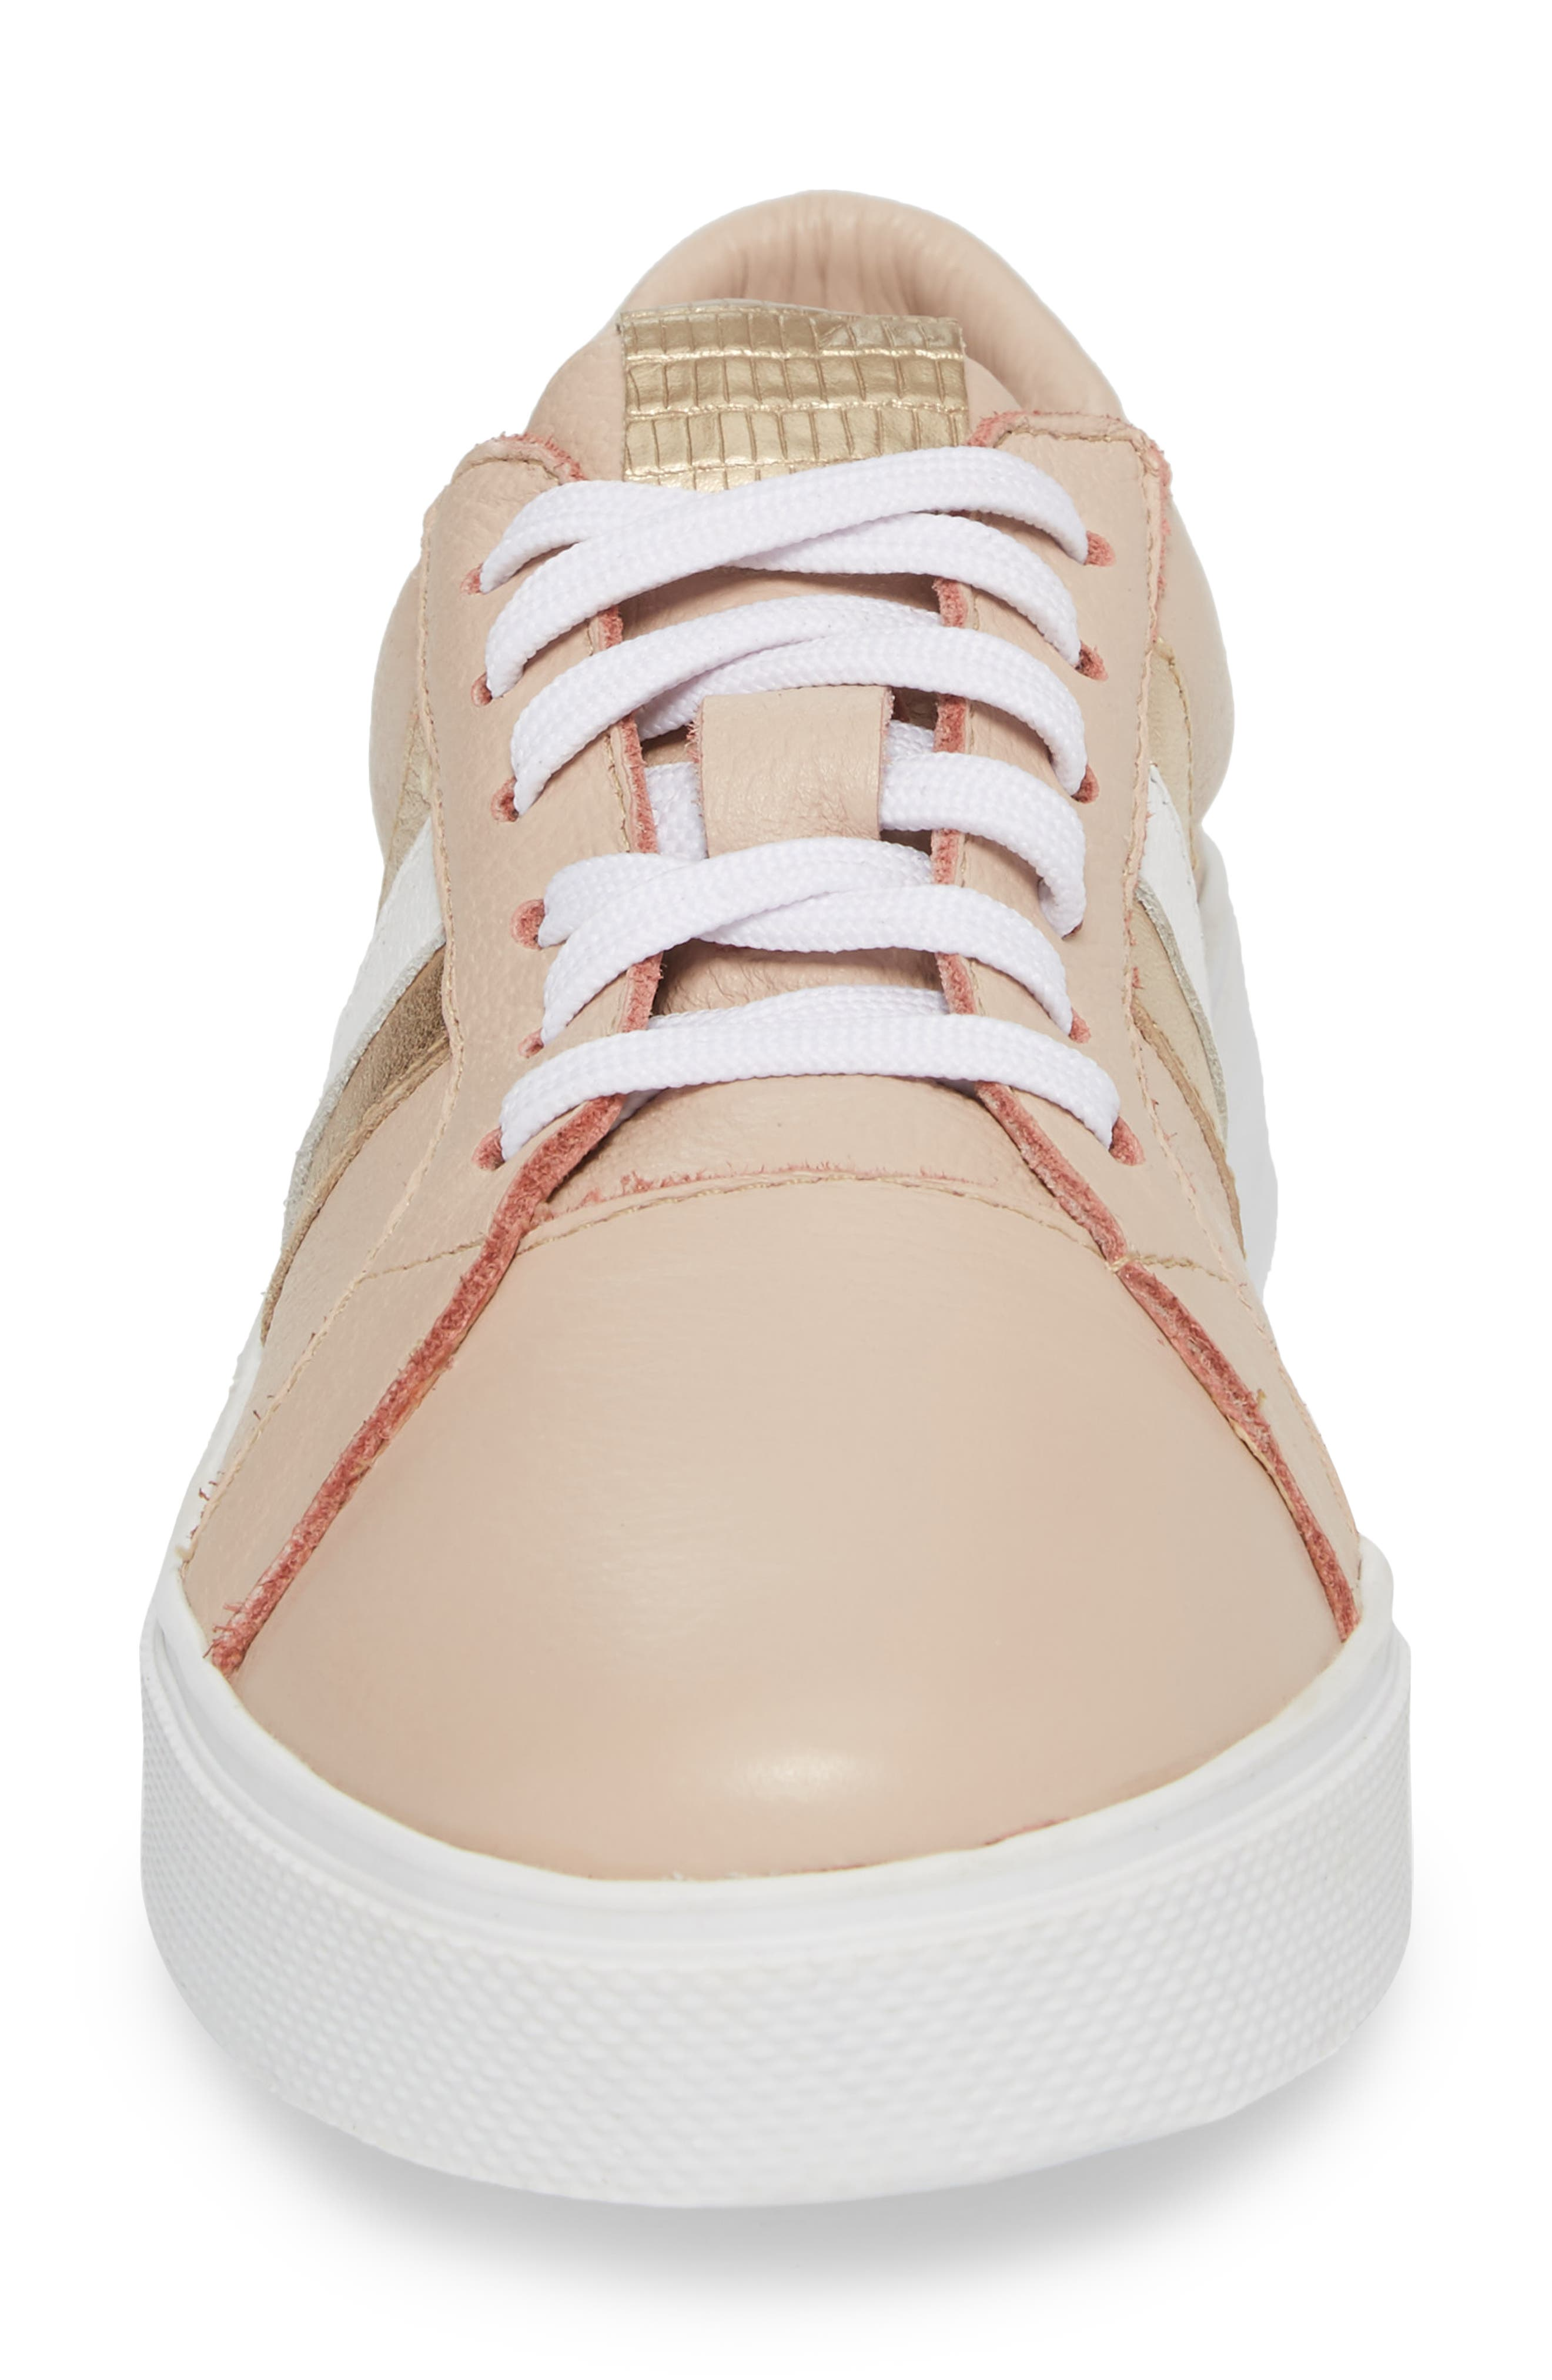 Tatacoa Low Top Sneaker,                             Alternate thumbnail 5, color,                             Blush